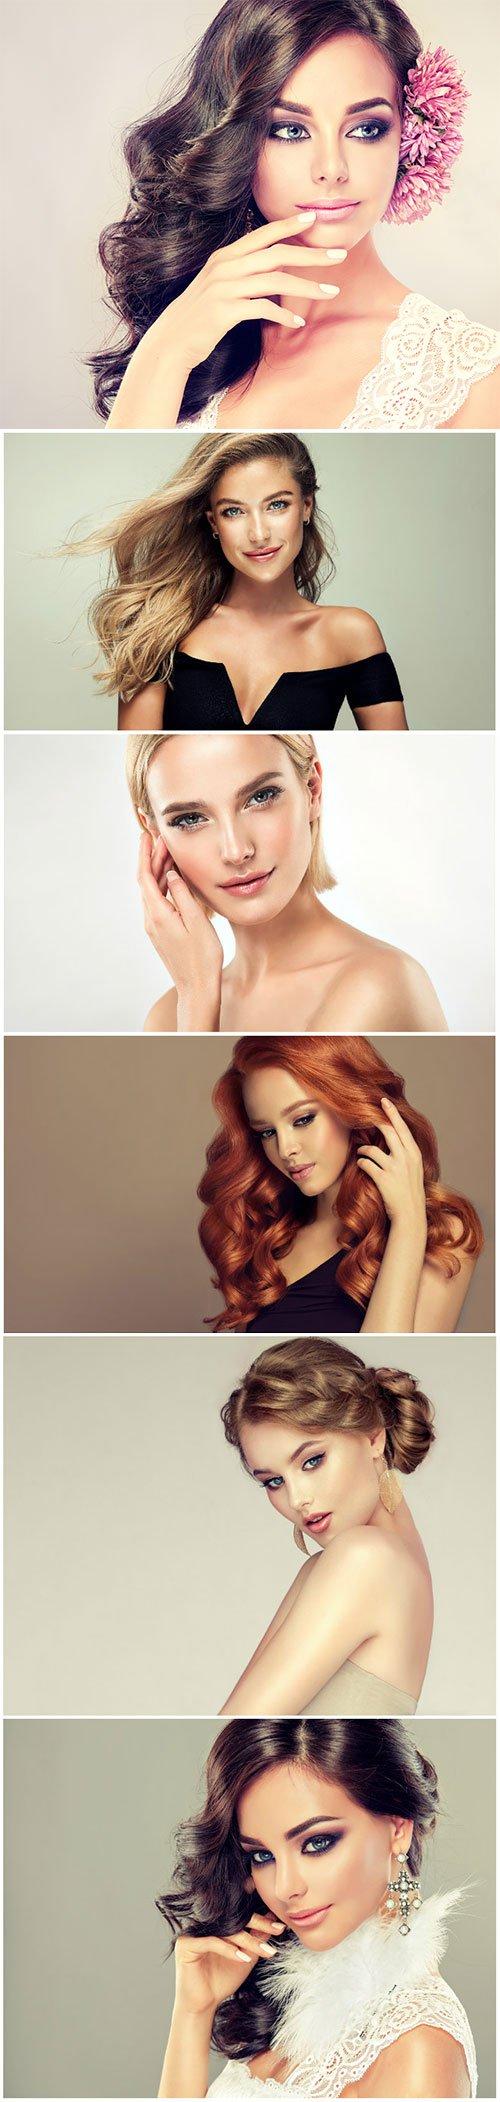 Beautiful girls, photo model girls in the studio # 2